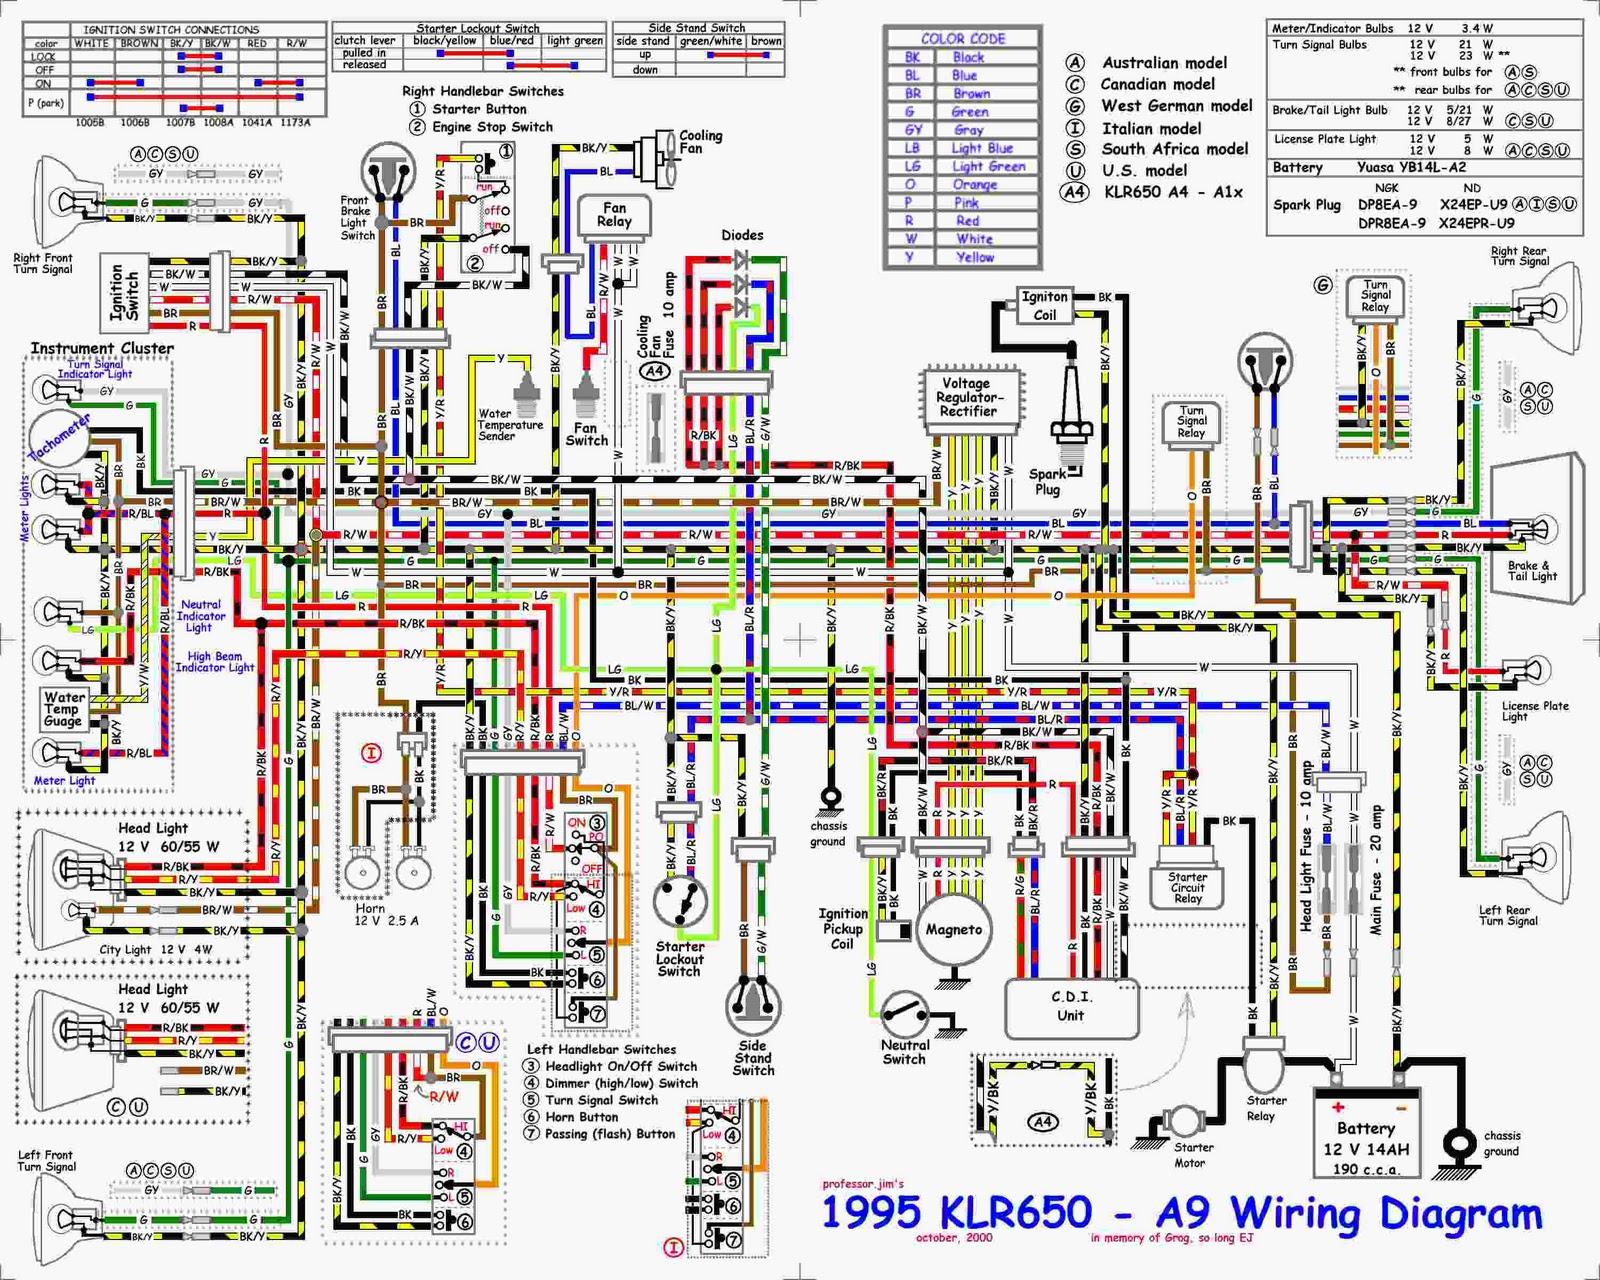 Jvc Kd G110 Wiring Diagram Hecho car stereo wire connectors ... Jvc Headunit Wiring Diagram on sub wiring diagram, snap on verus wiring diagram, grasshopper 721d wiring diagram, aux input wiring diagram, pioneer avh-p4100dvd wiring diagram, head unit wiring diagram,